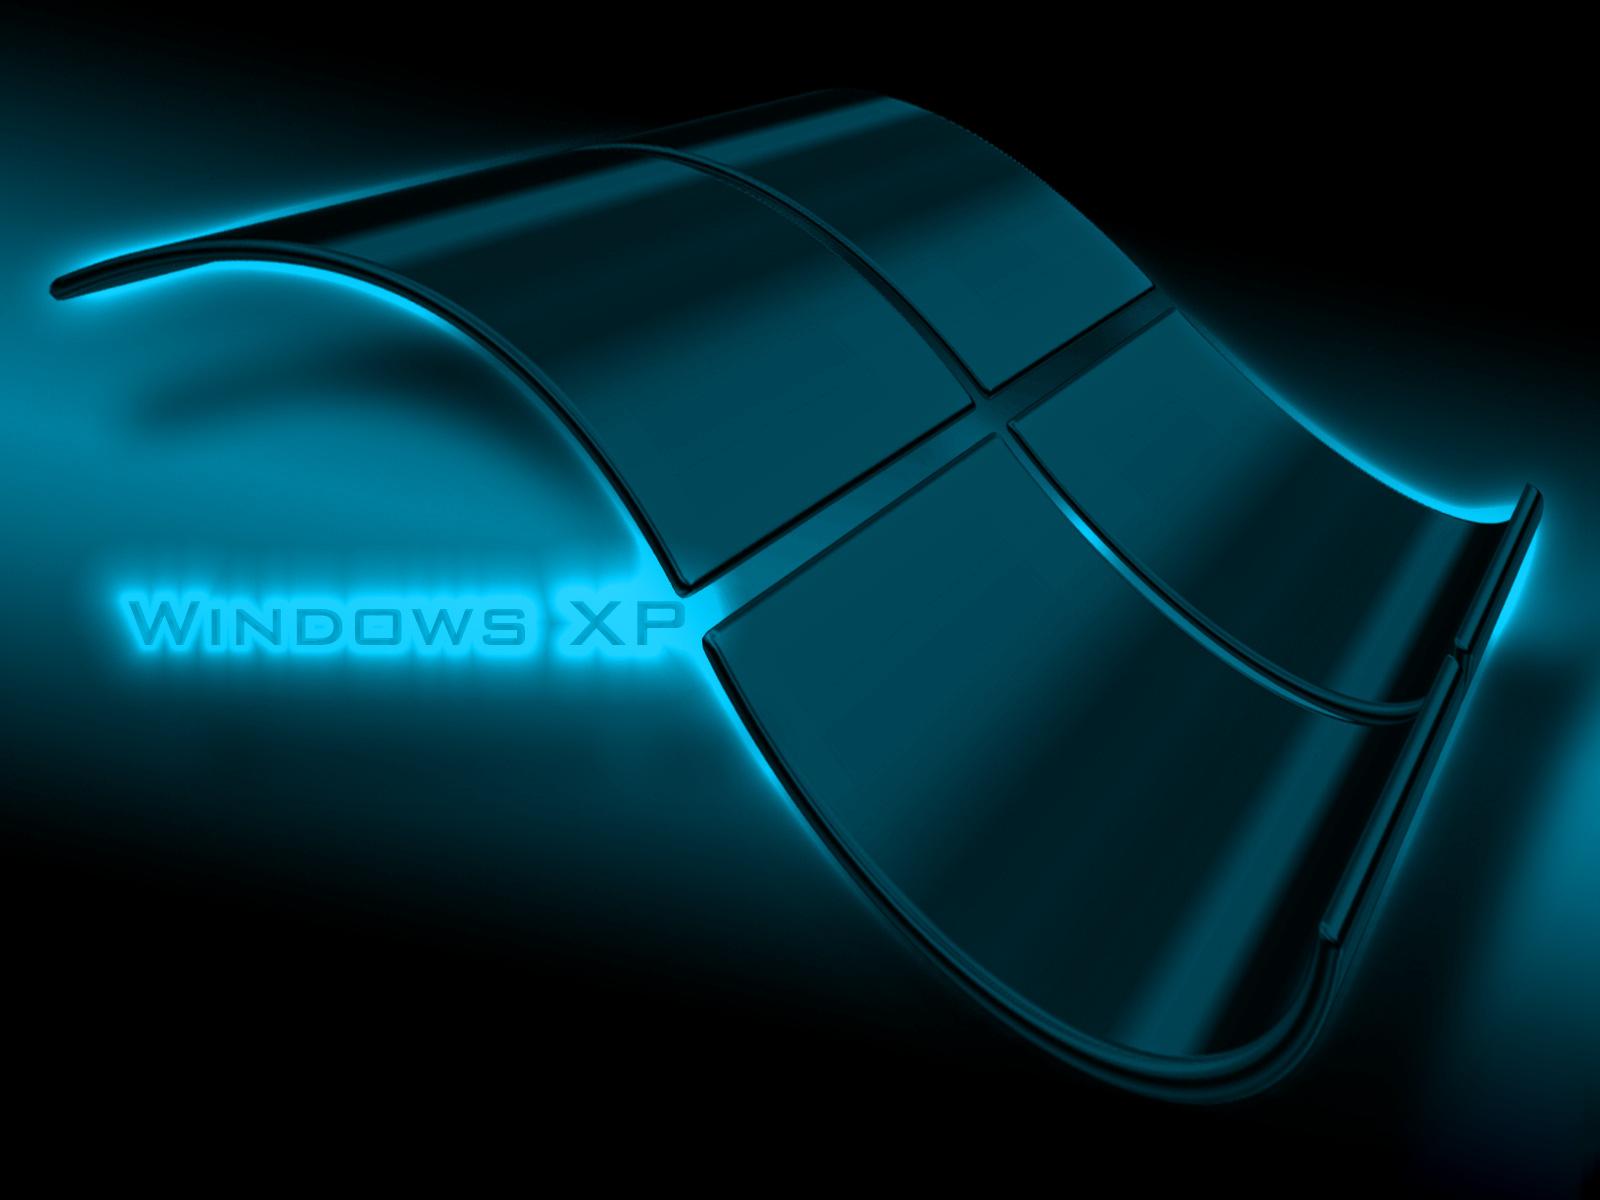 3d Desktop Wallpapers   CAR WALLPAPERS godong 1600x1200